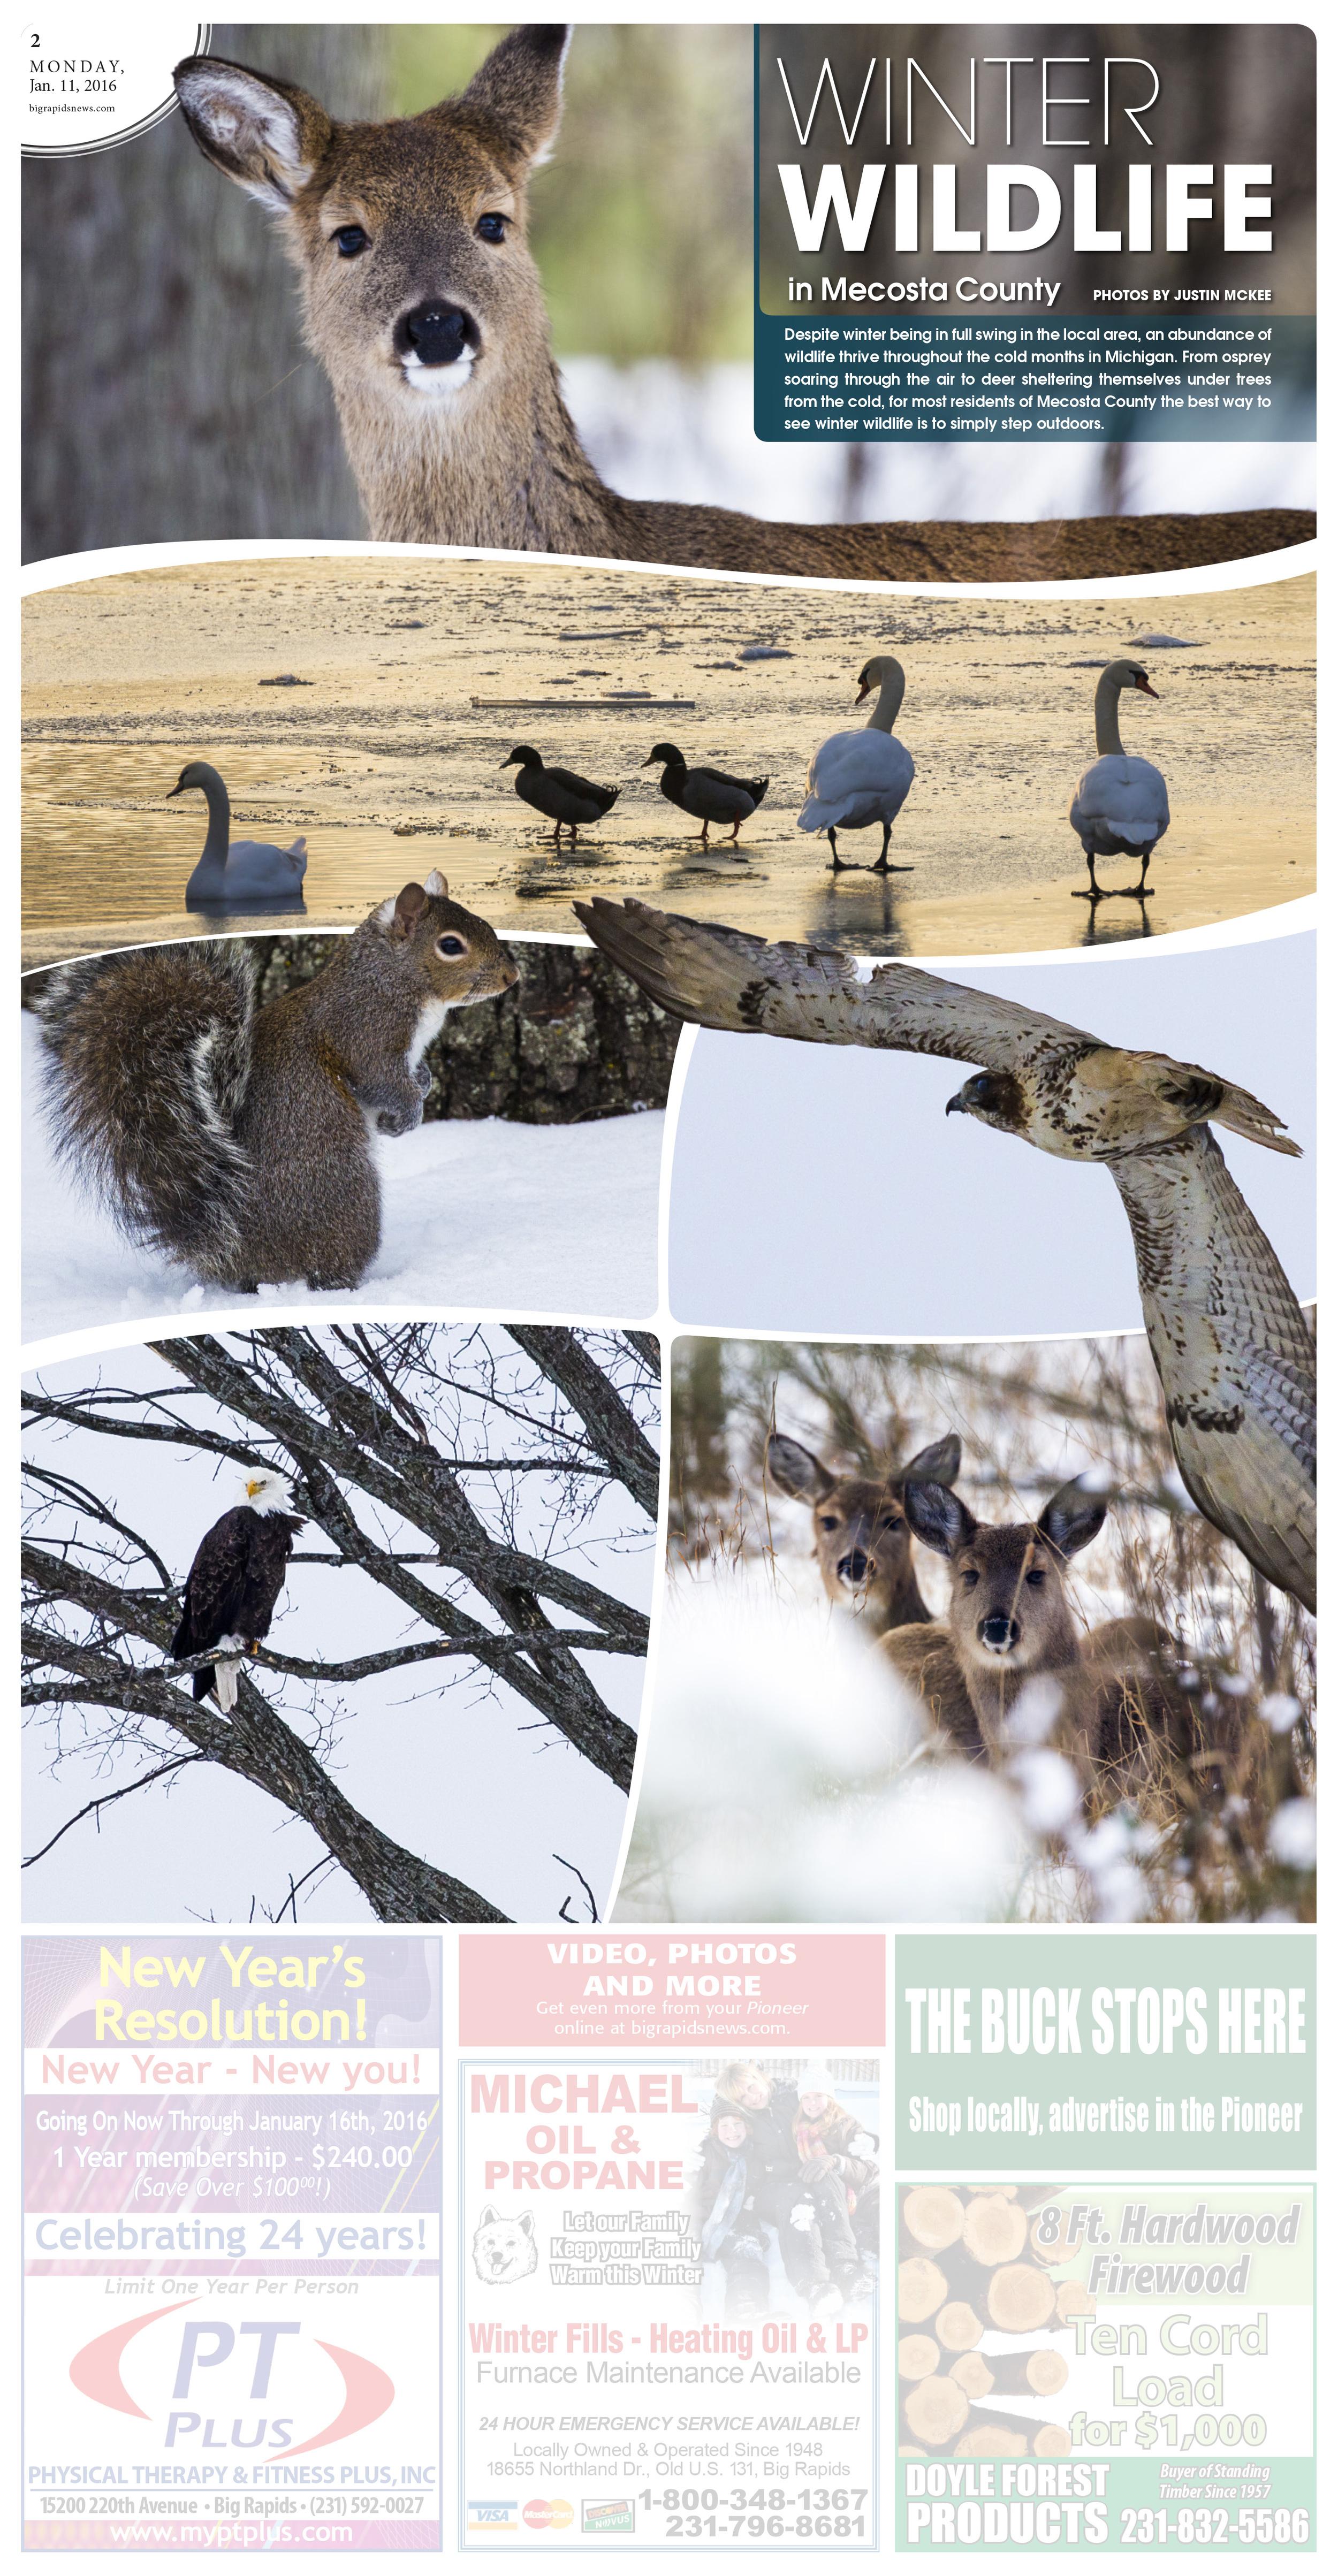 Winter Wildlife in Mecosta County